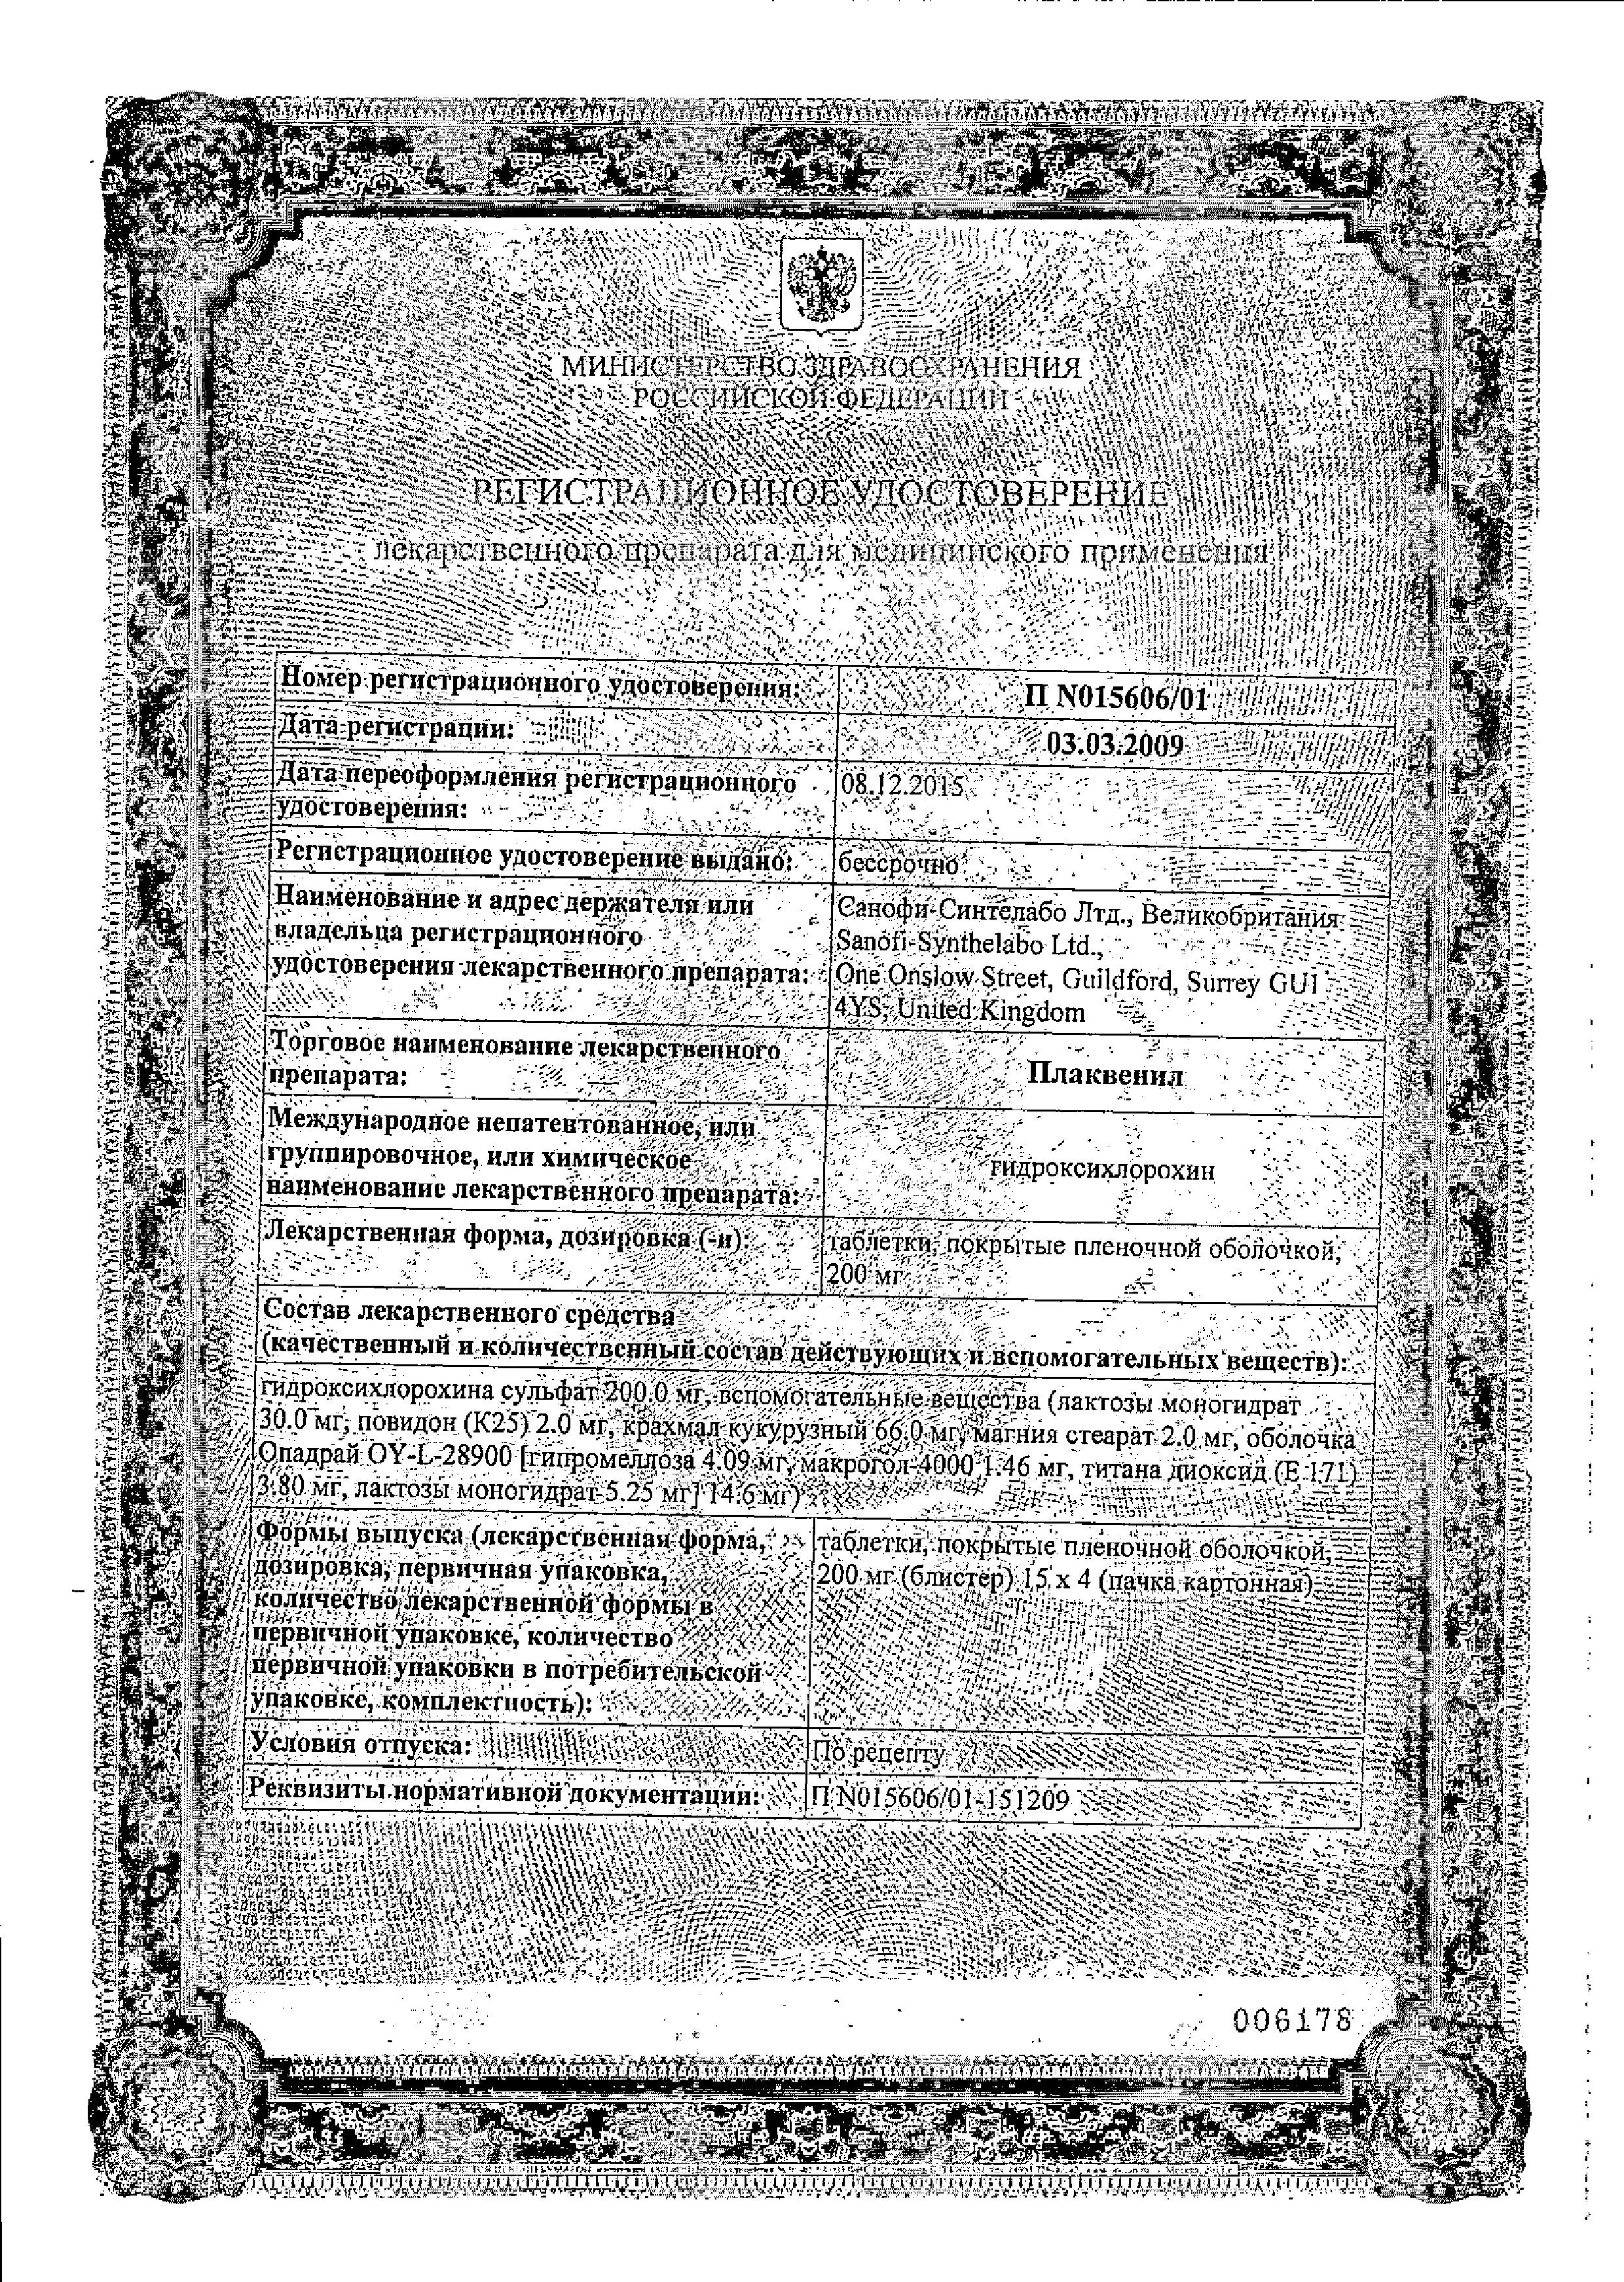 Плаквенил сертификат